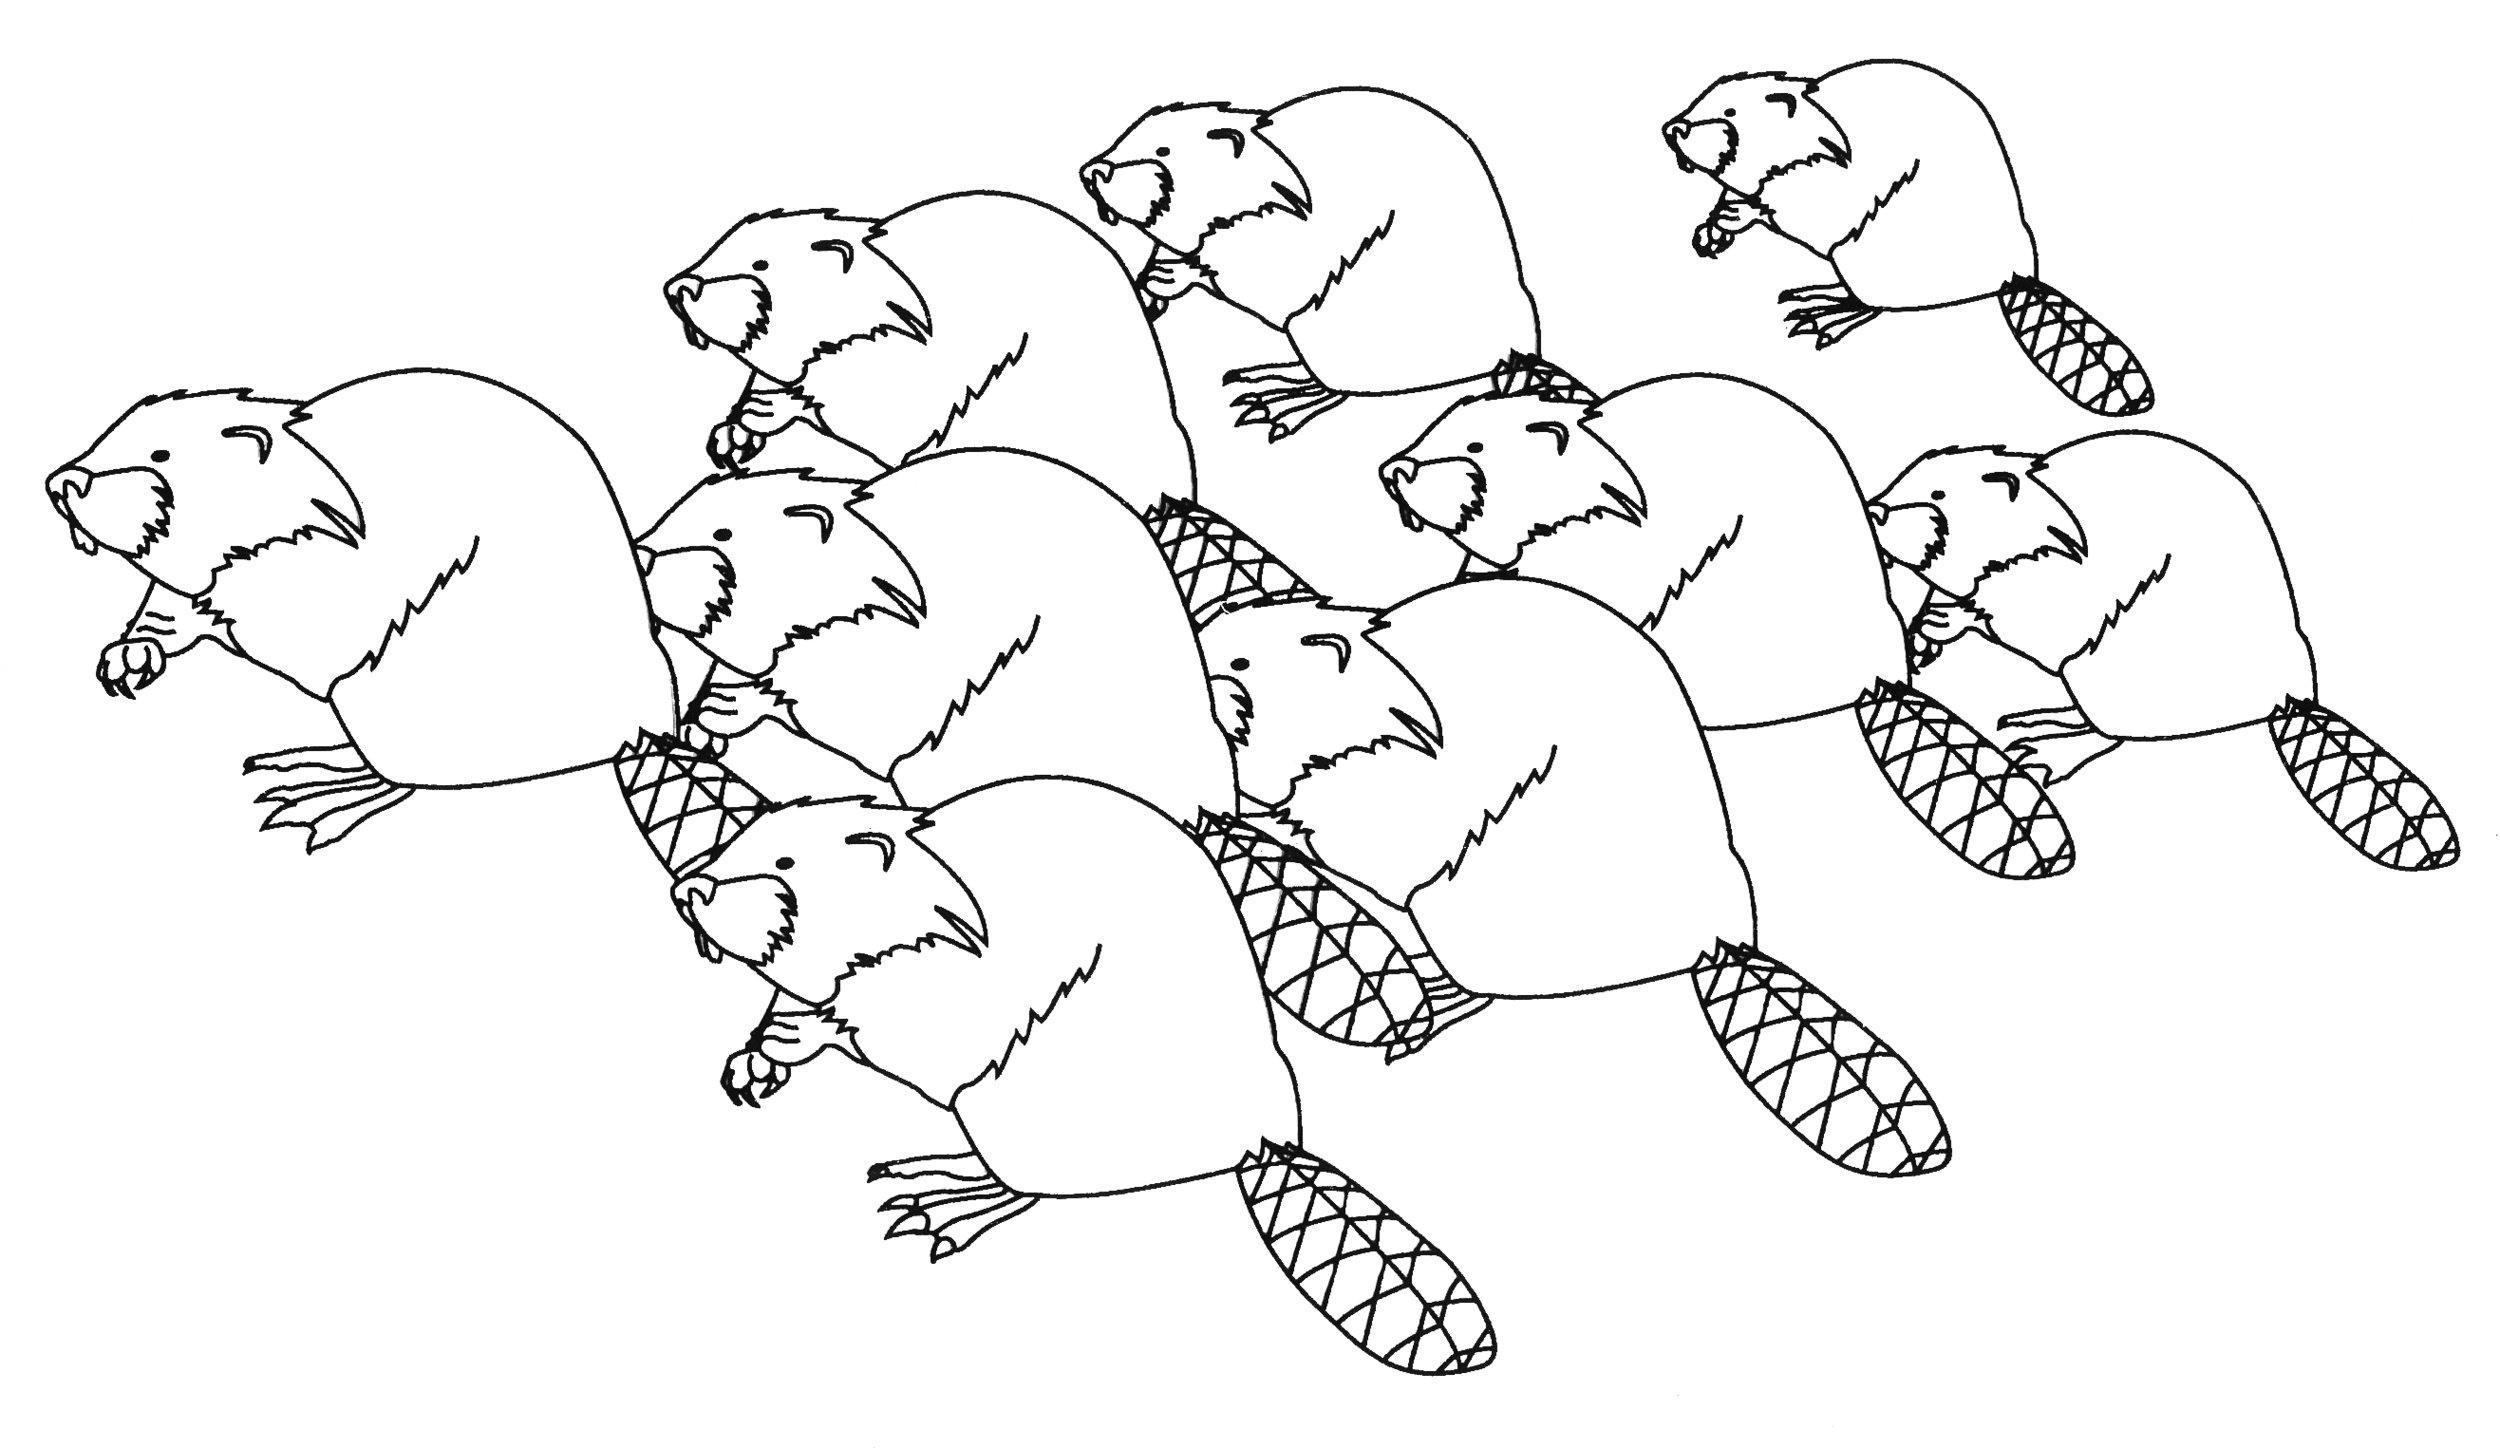 45_beavers3.jpg